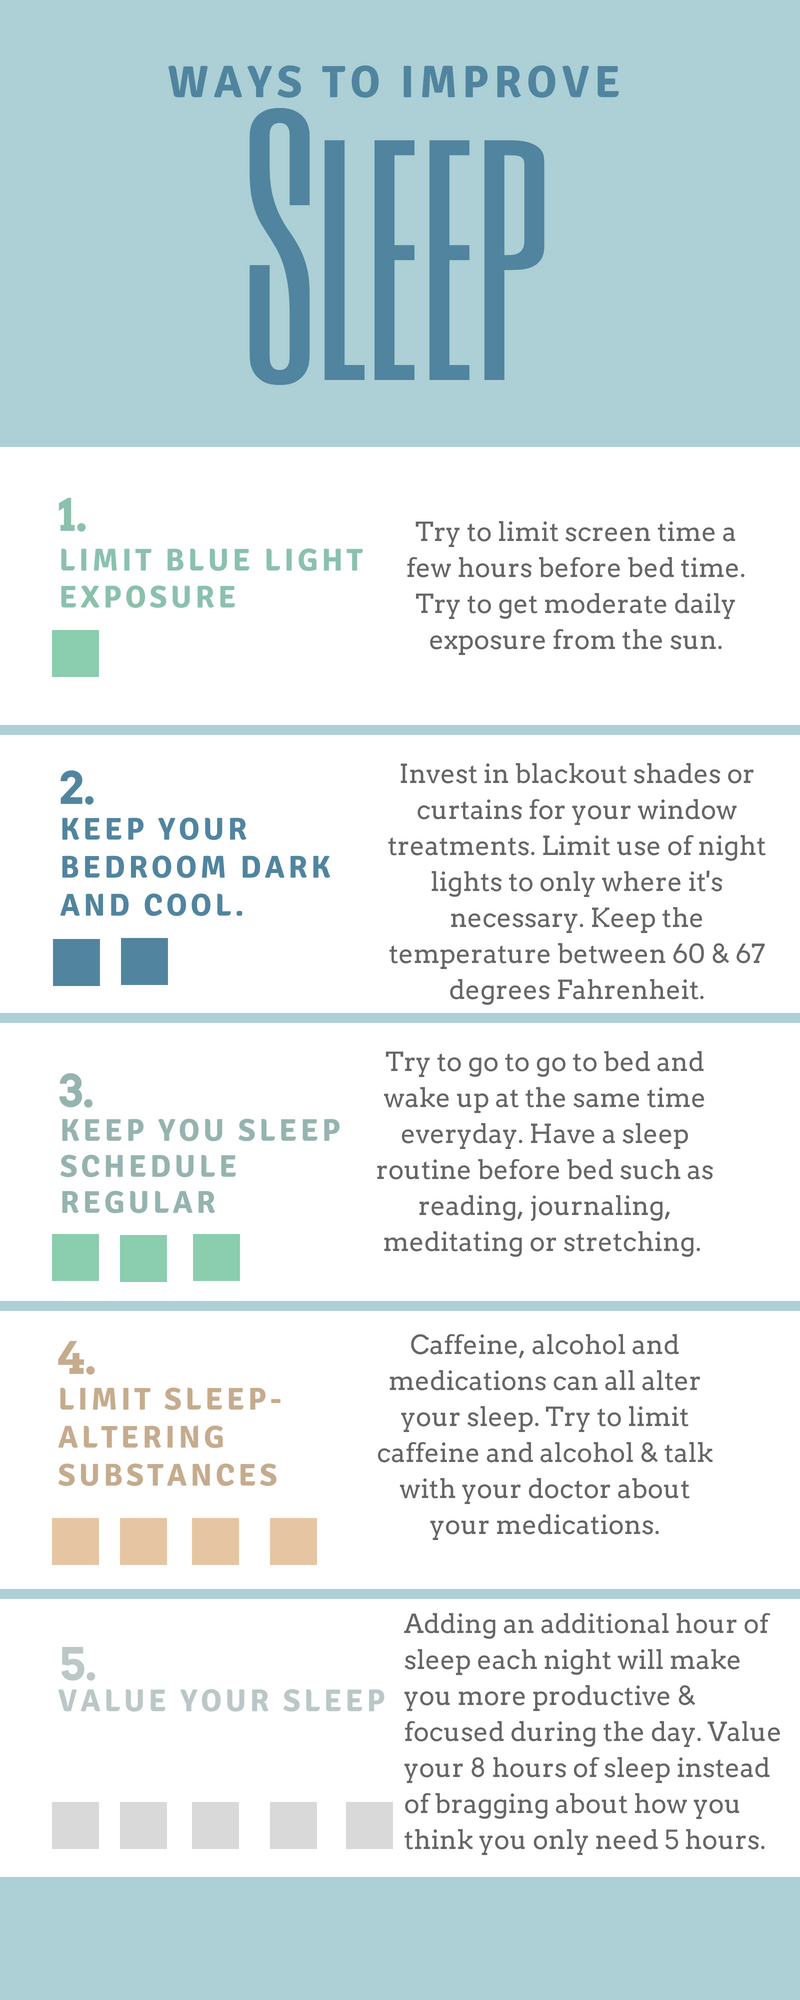 Sleep info.png